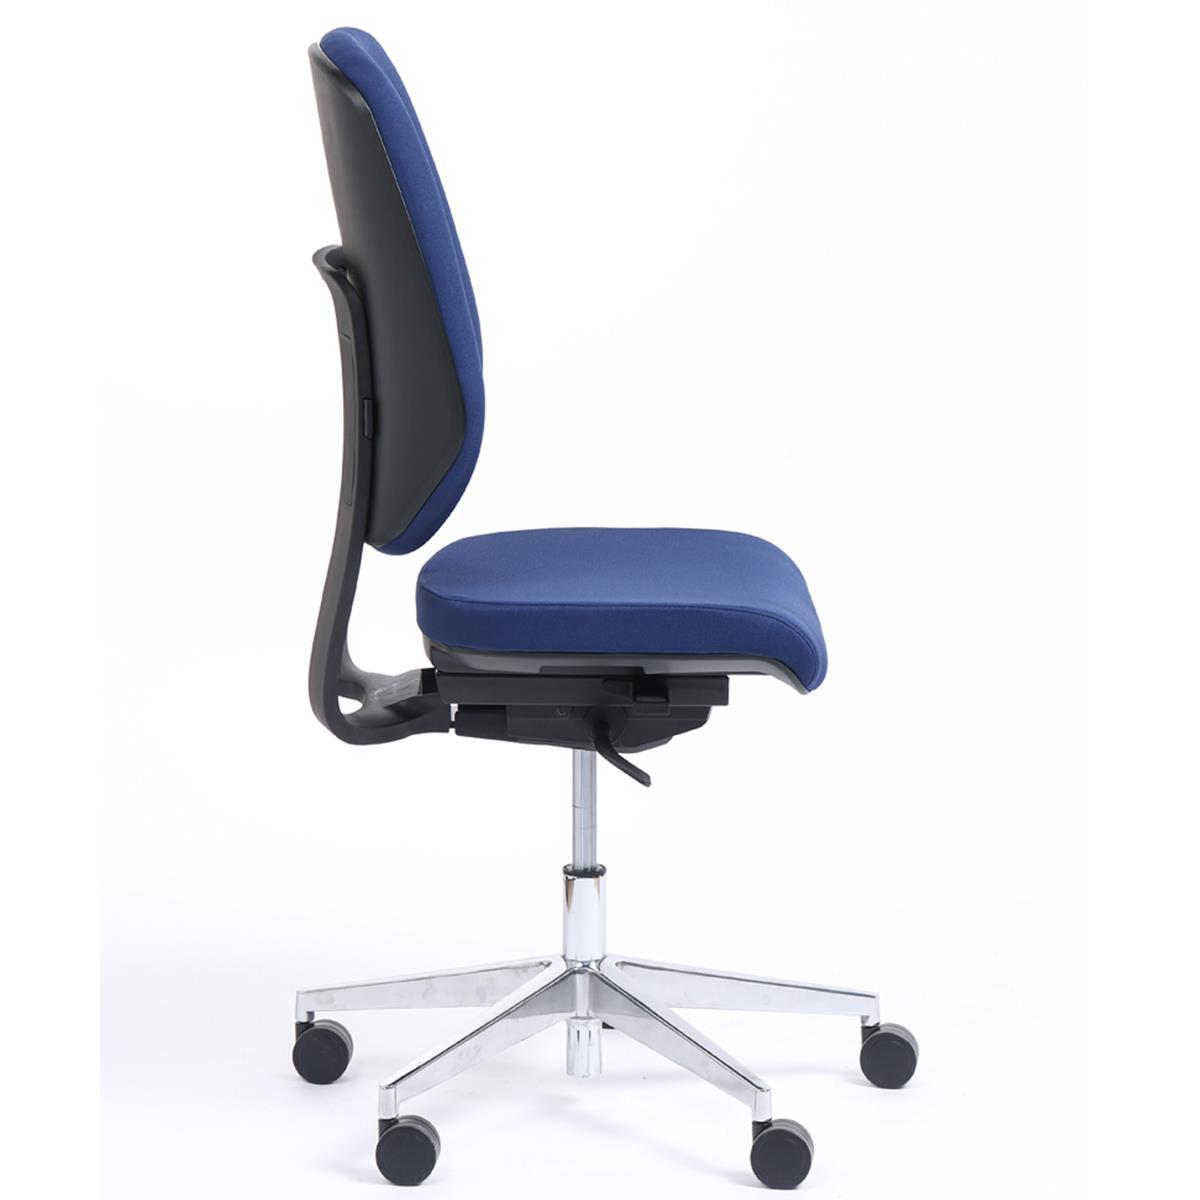 FeuBleu Tissu AjustableUtilisation AccoudoirsDossier Chaise Bureau Sans 8hEn De Belcastel Anti F1JTlKc